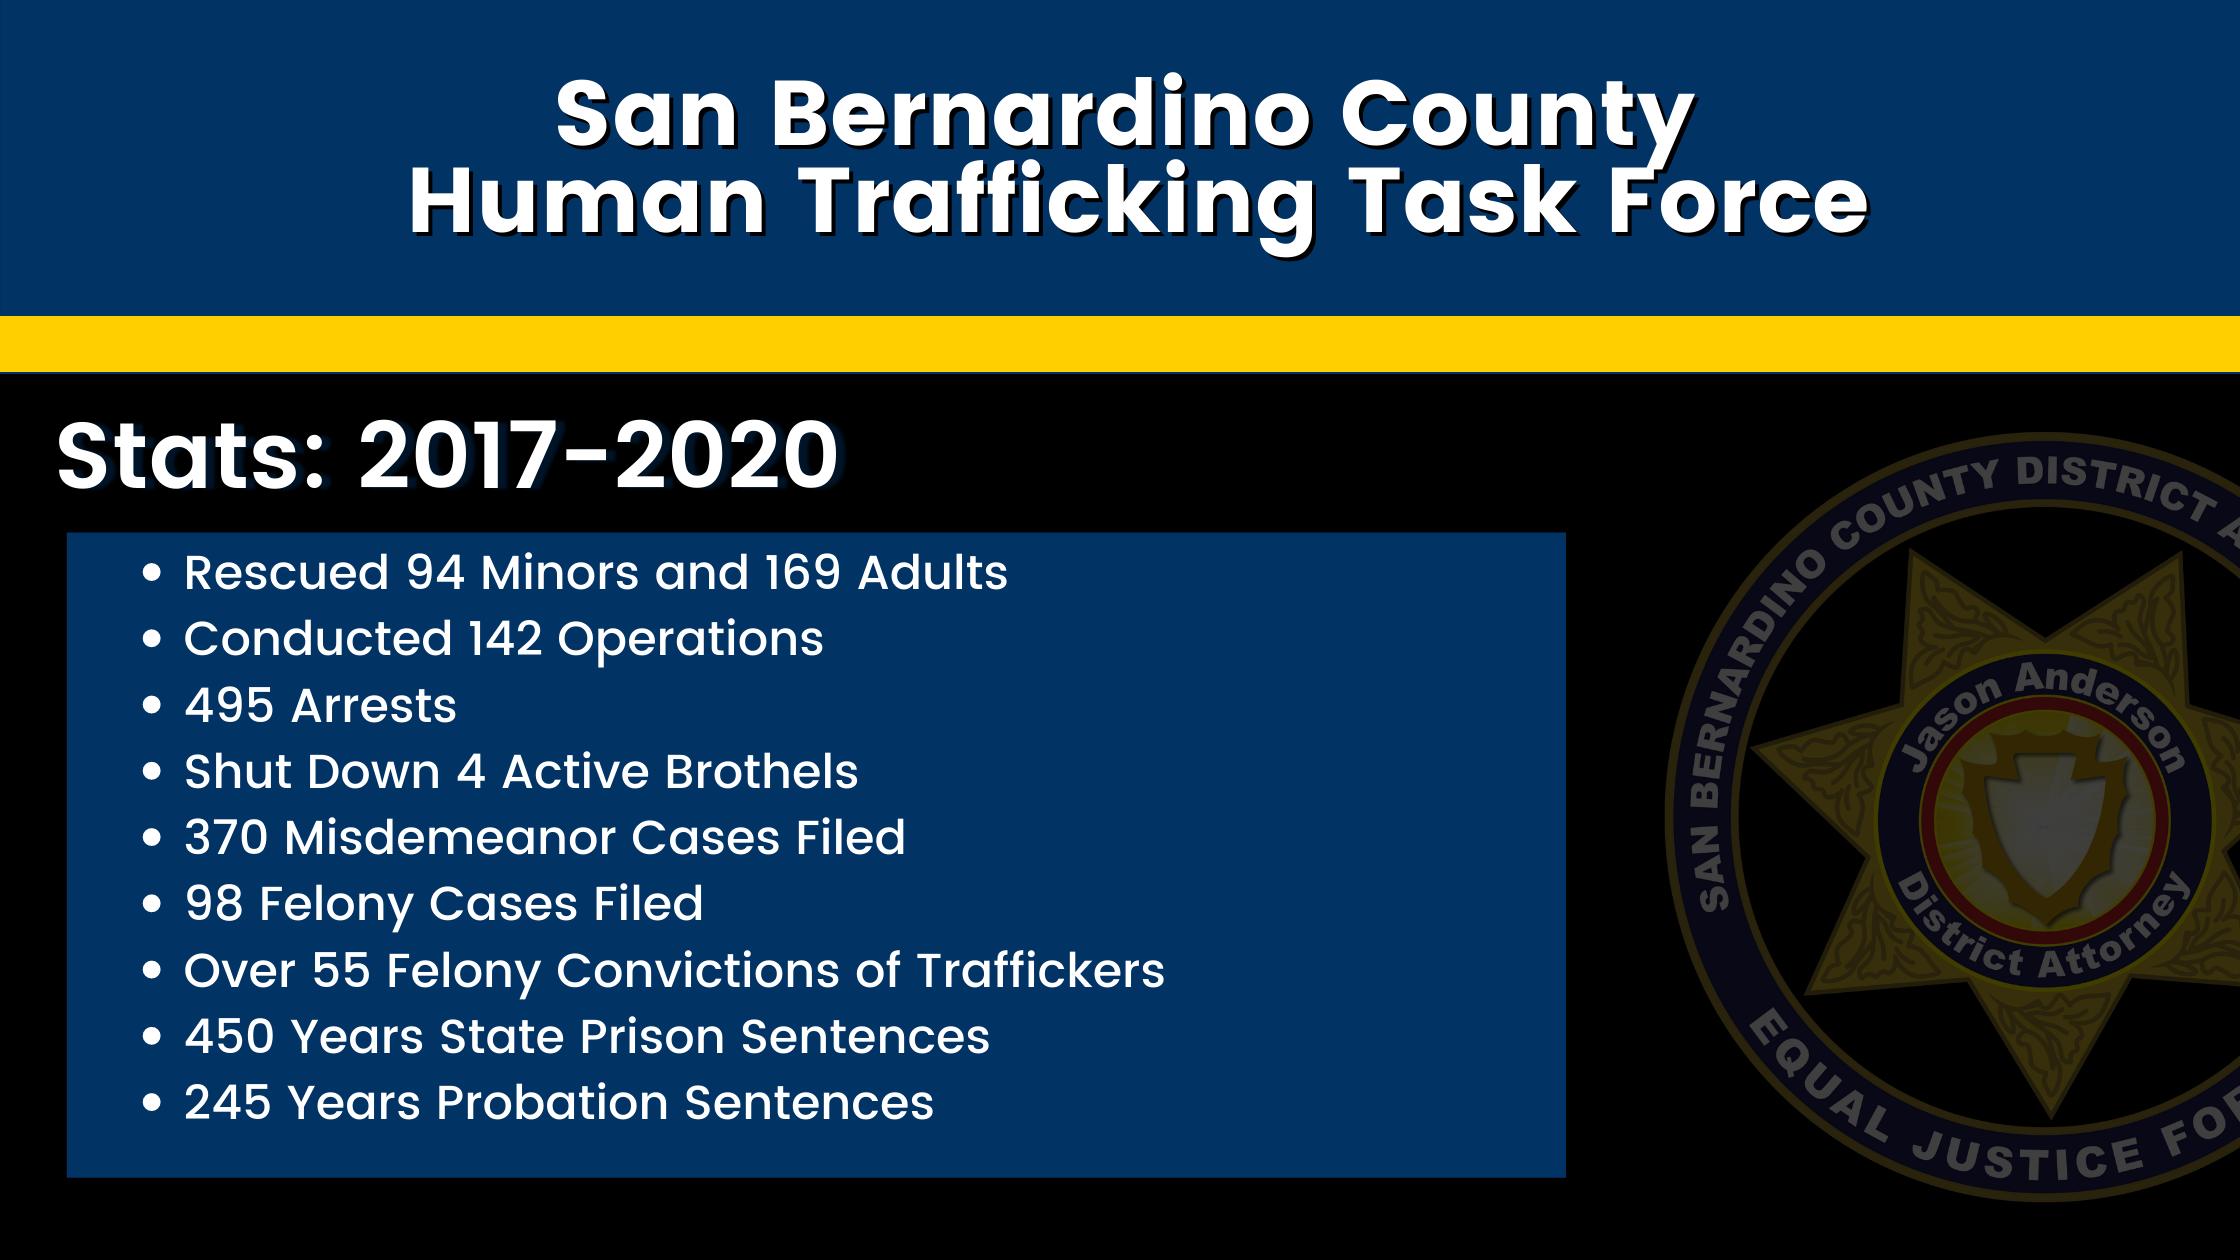 Human Trafficking Task Force statistics